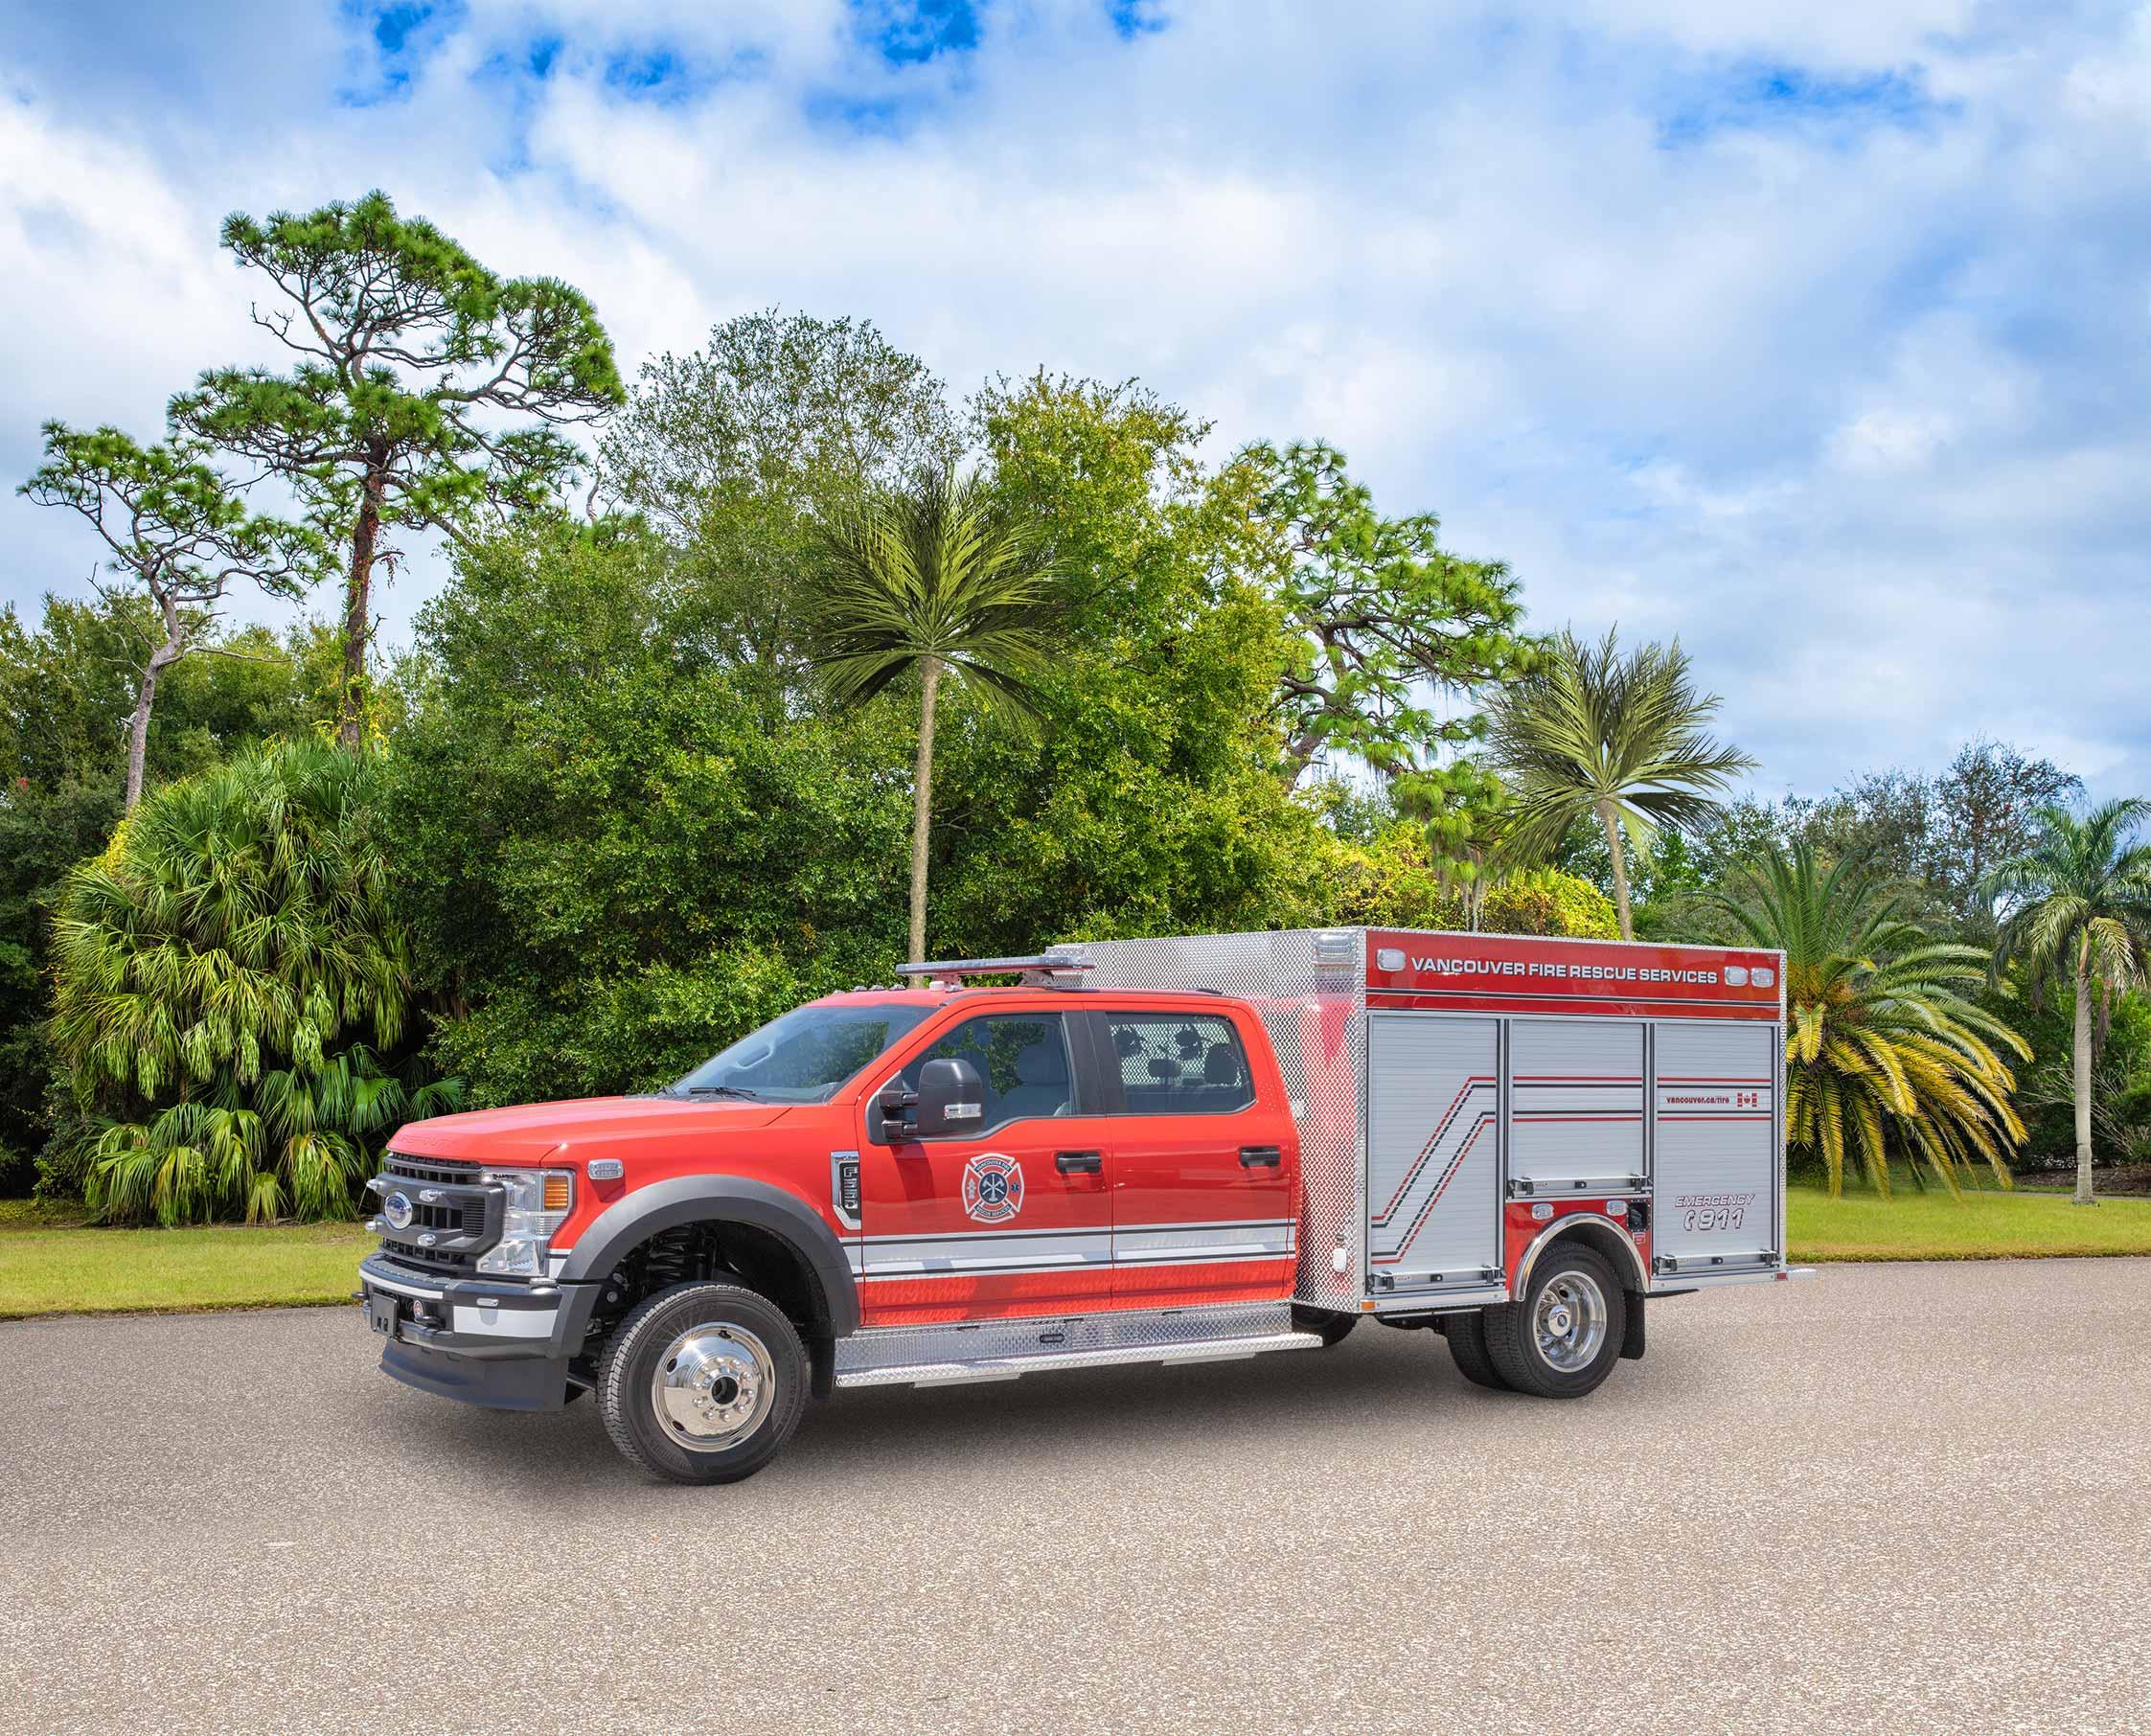 Vancouver Fire Department - Rescue